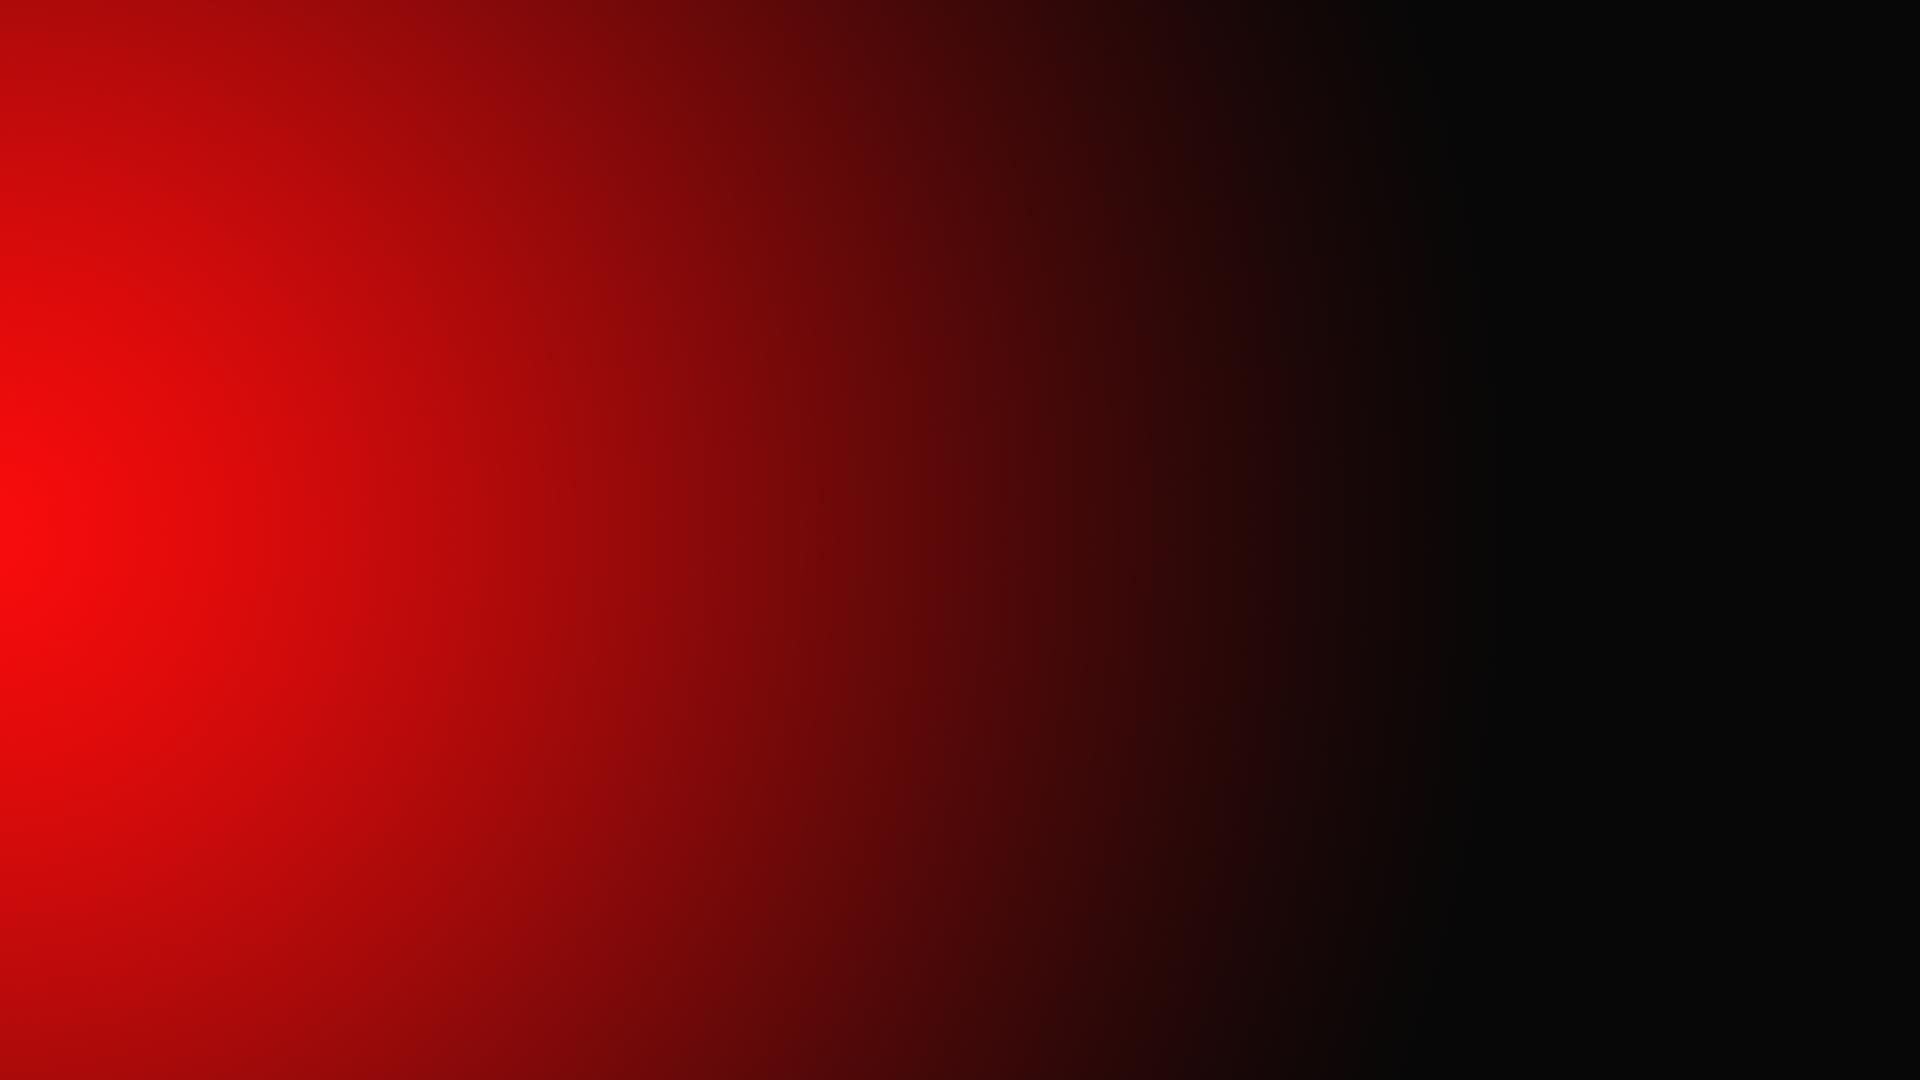 Red And Black Wallpaper 12 Desktop Background - Hdblackwallpaper.com